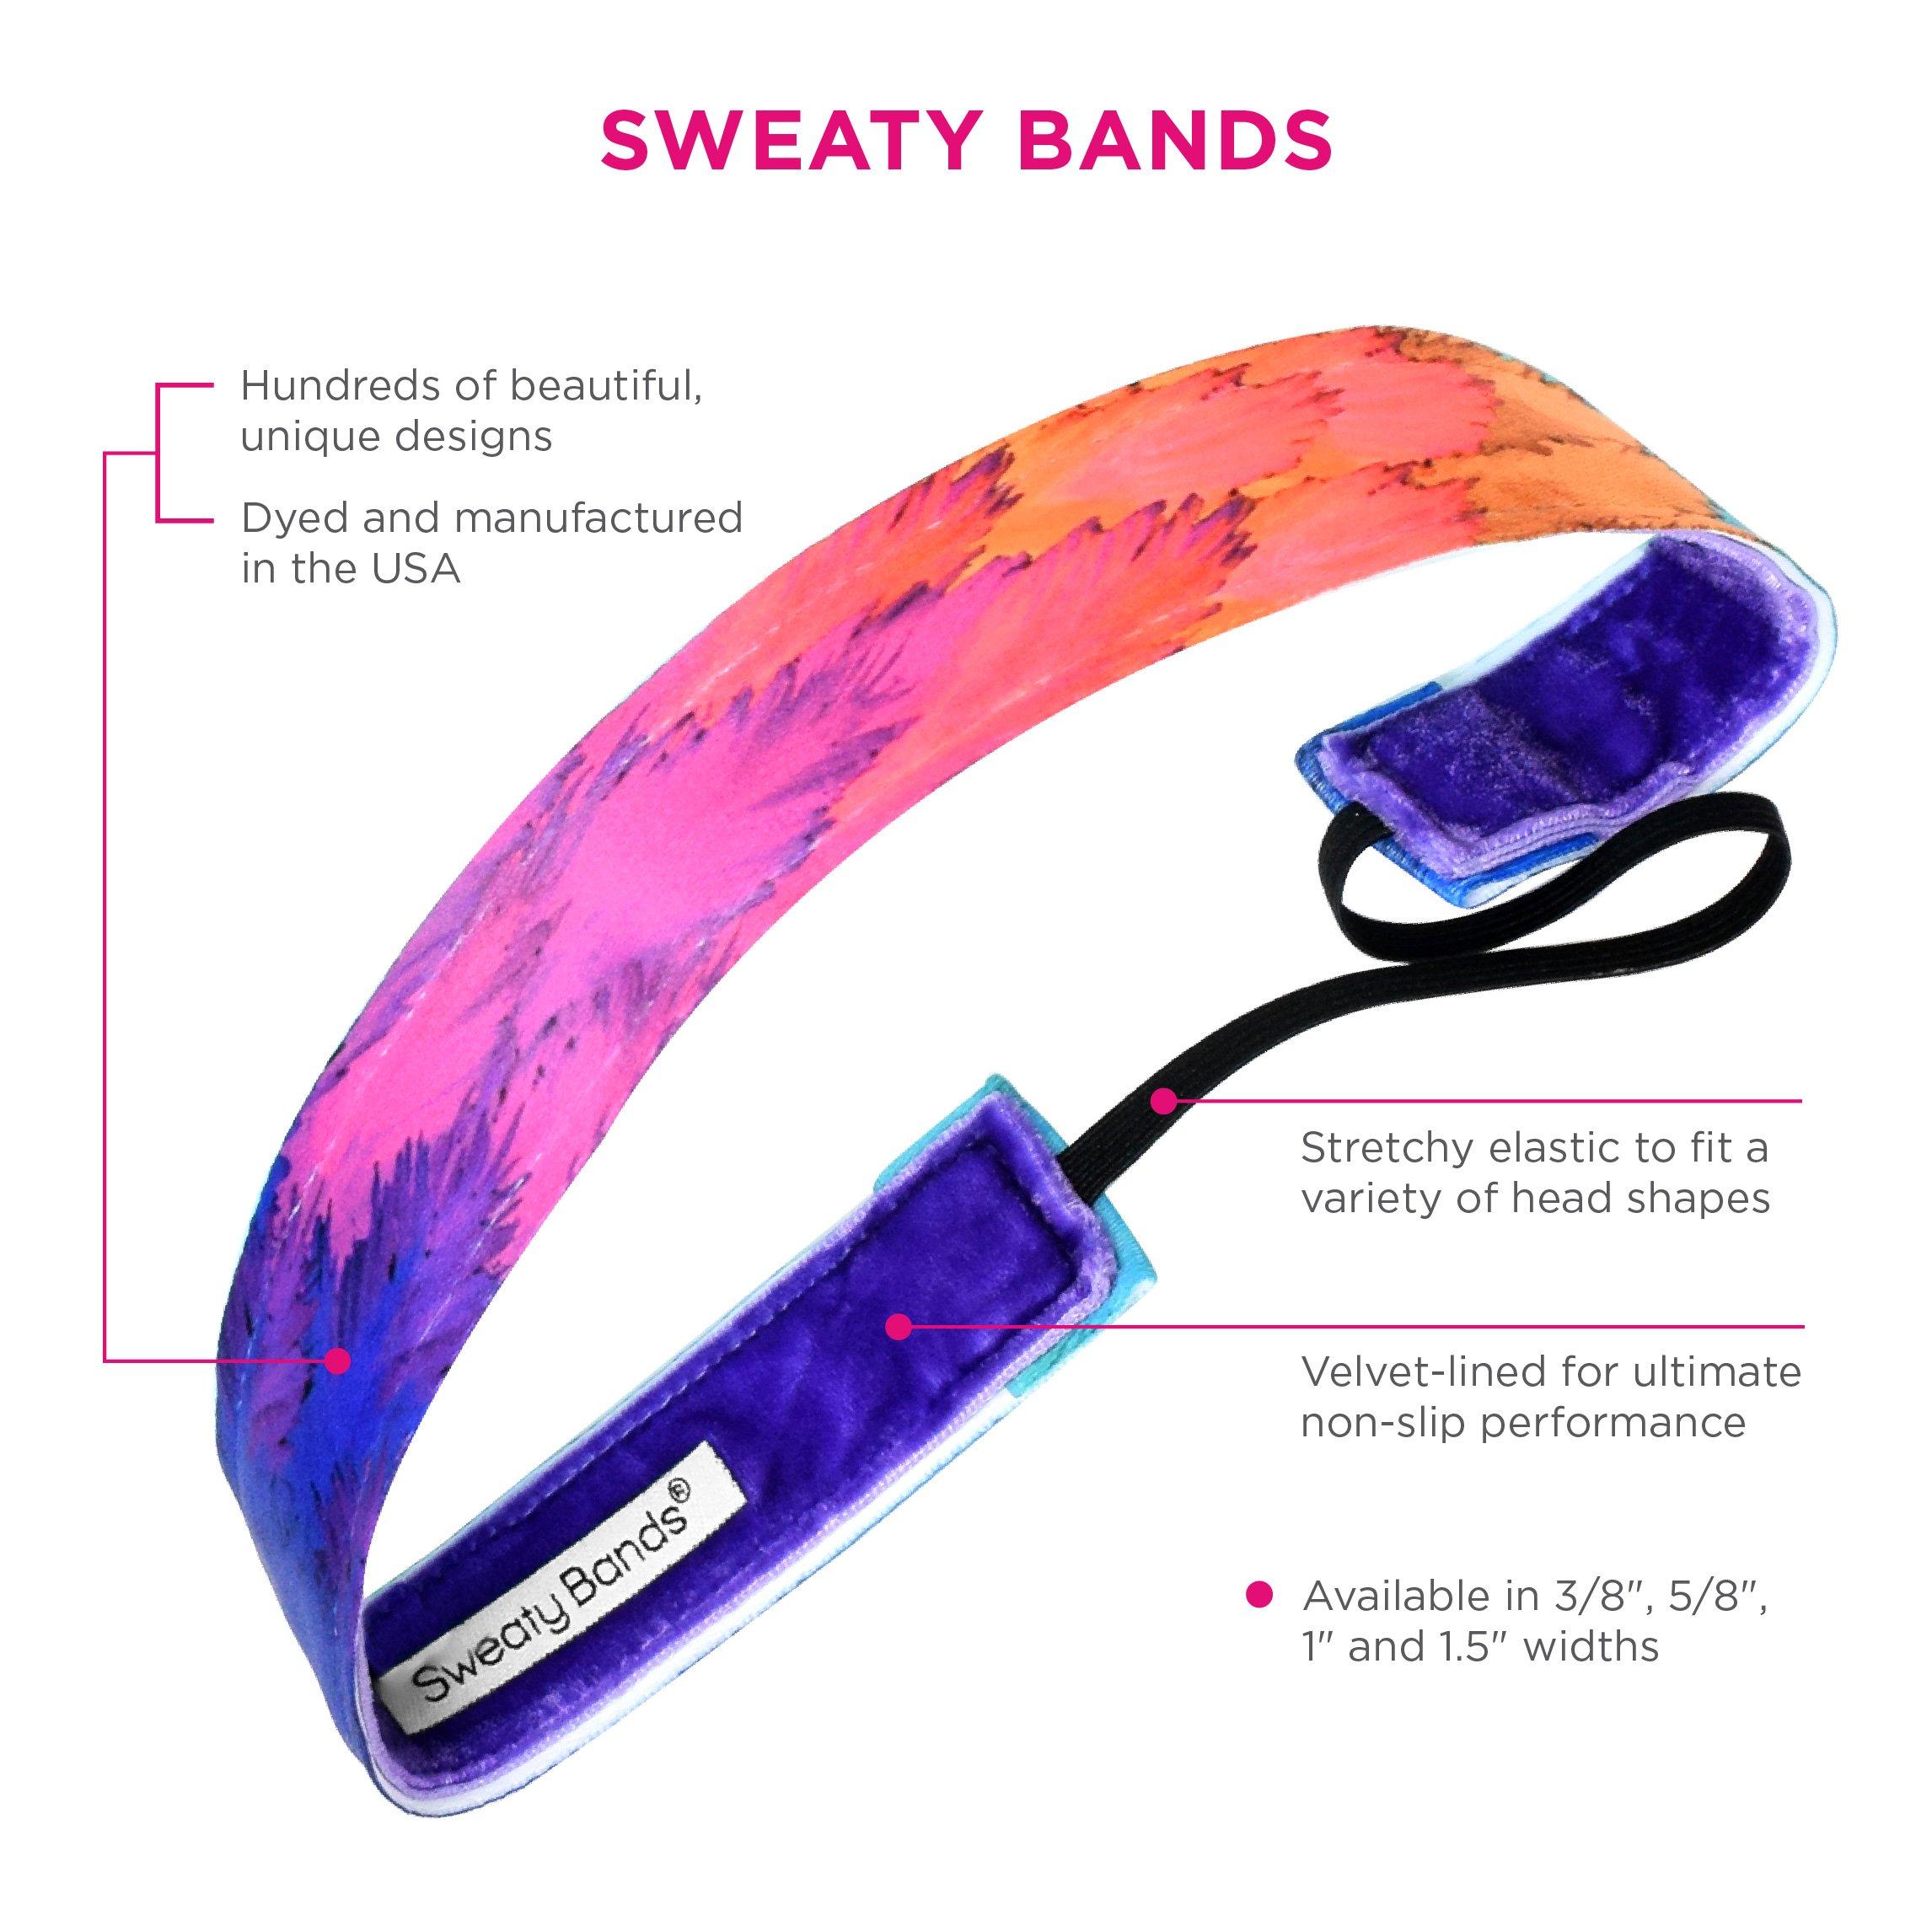 Sweaty Bands Womens Girls Headband - Non-Slip Velvet-Lined Athletic Hairband - Bottom's Up by Sweaty Bands (Image #5)